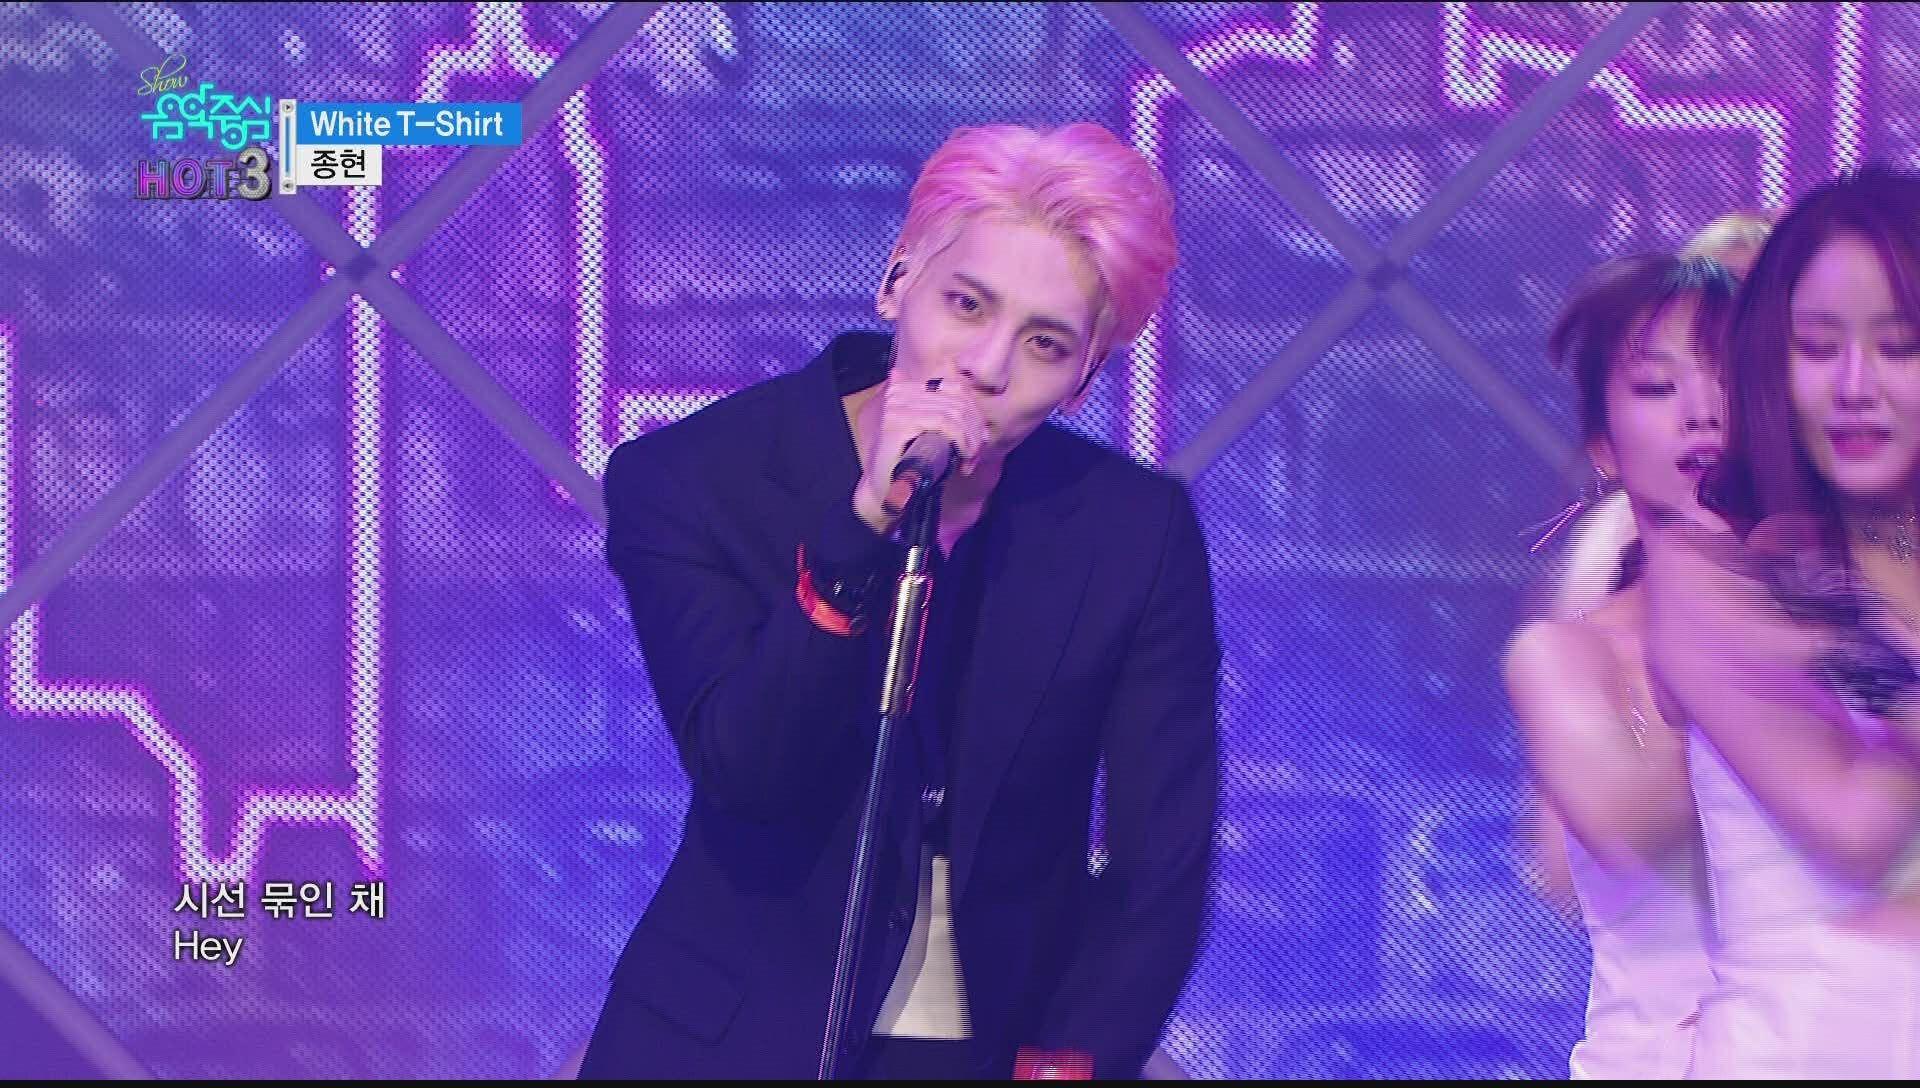 [Comeback Stage] JONG HYUN - White T-Shirt, 종현 - 화이트 티셔츠 Show Music core...